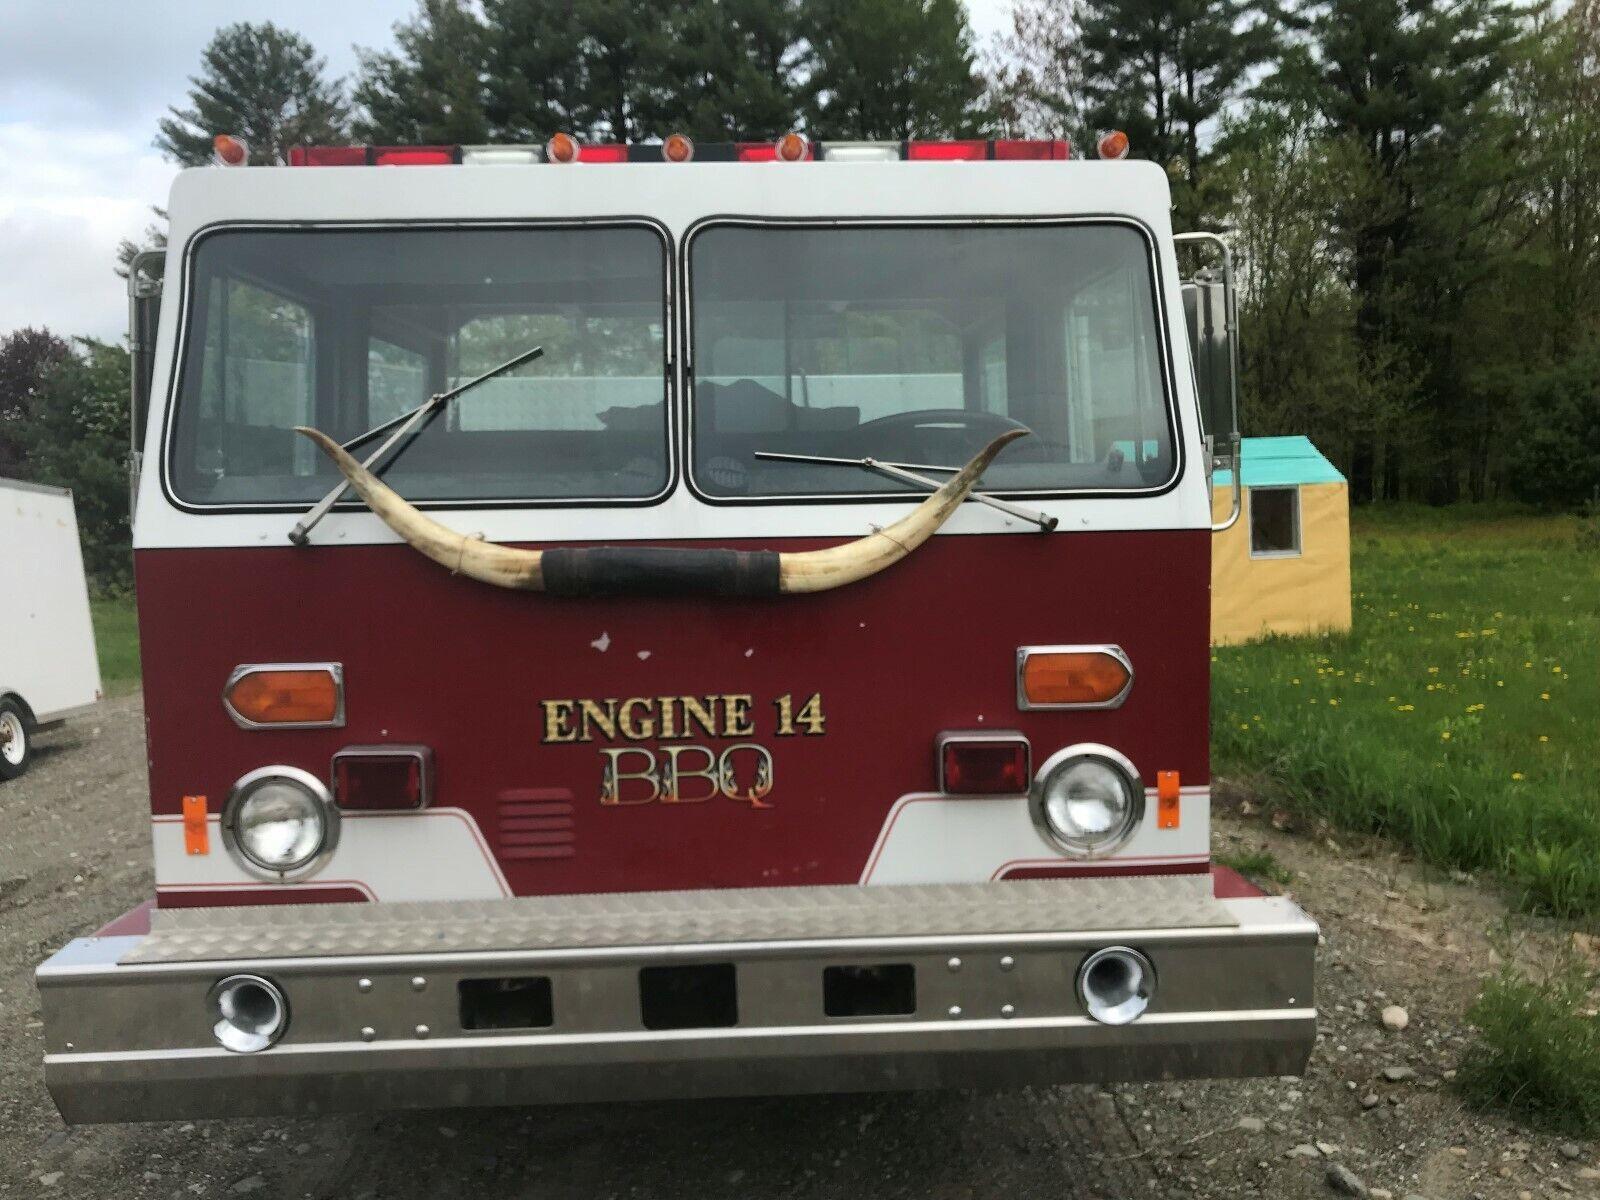 Photo BBQ food truck Pig Roaster Engine 14 party rig 3 keg beer taps